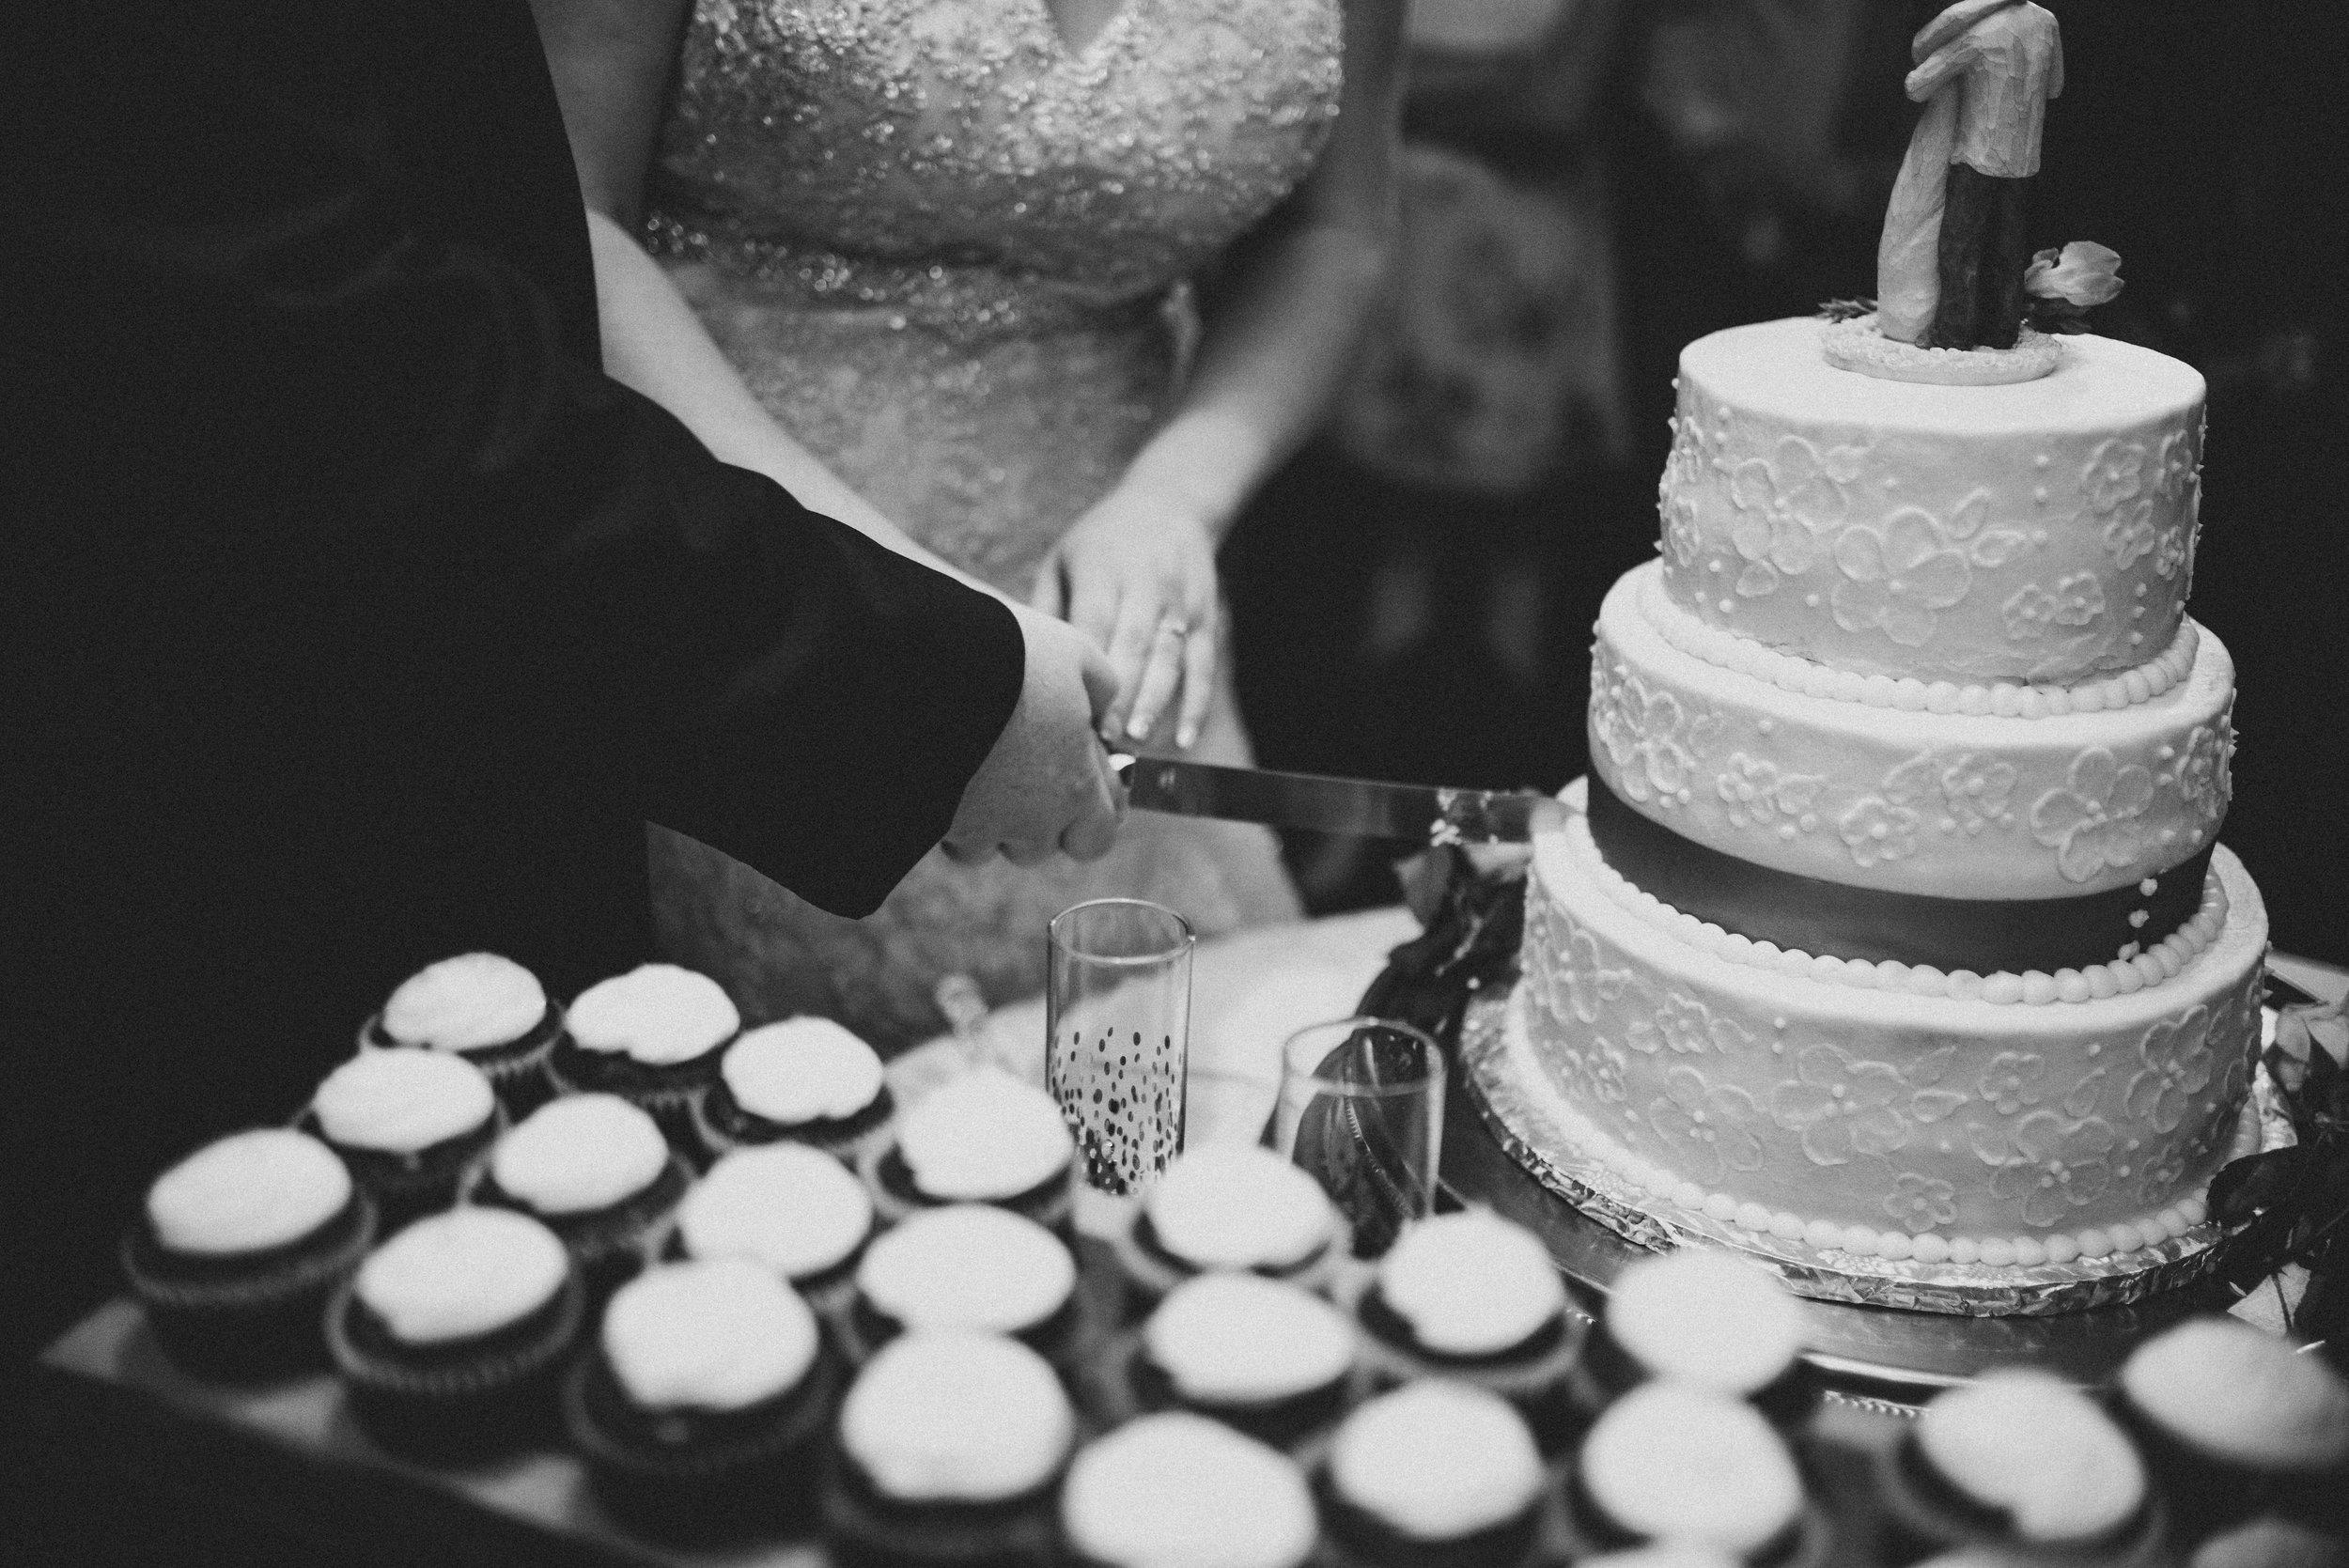 cutting-the-wedding-cake.jpg